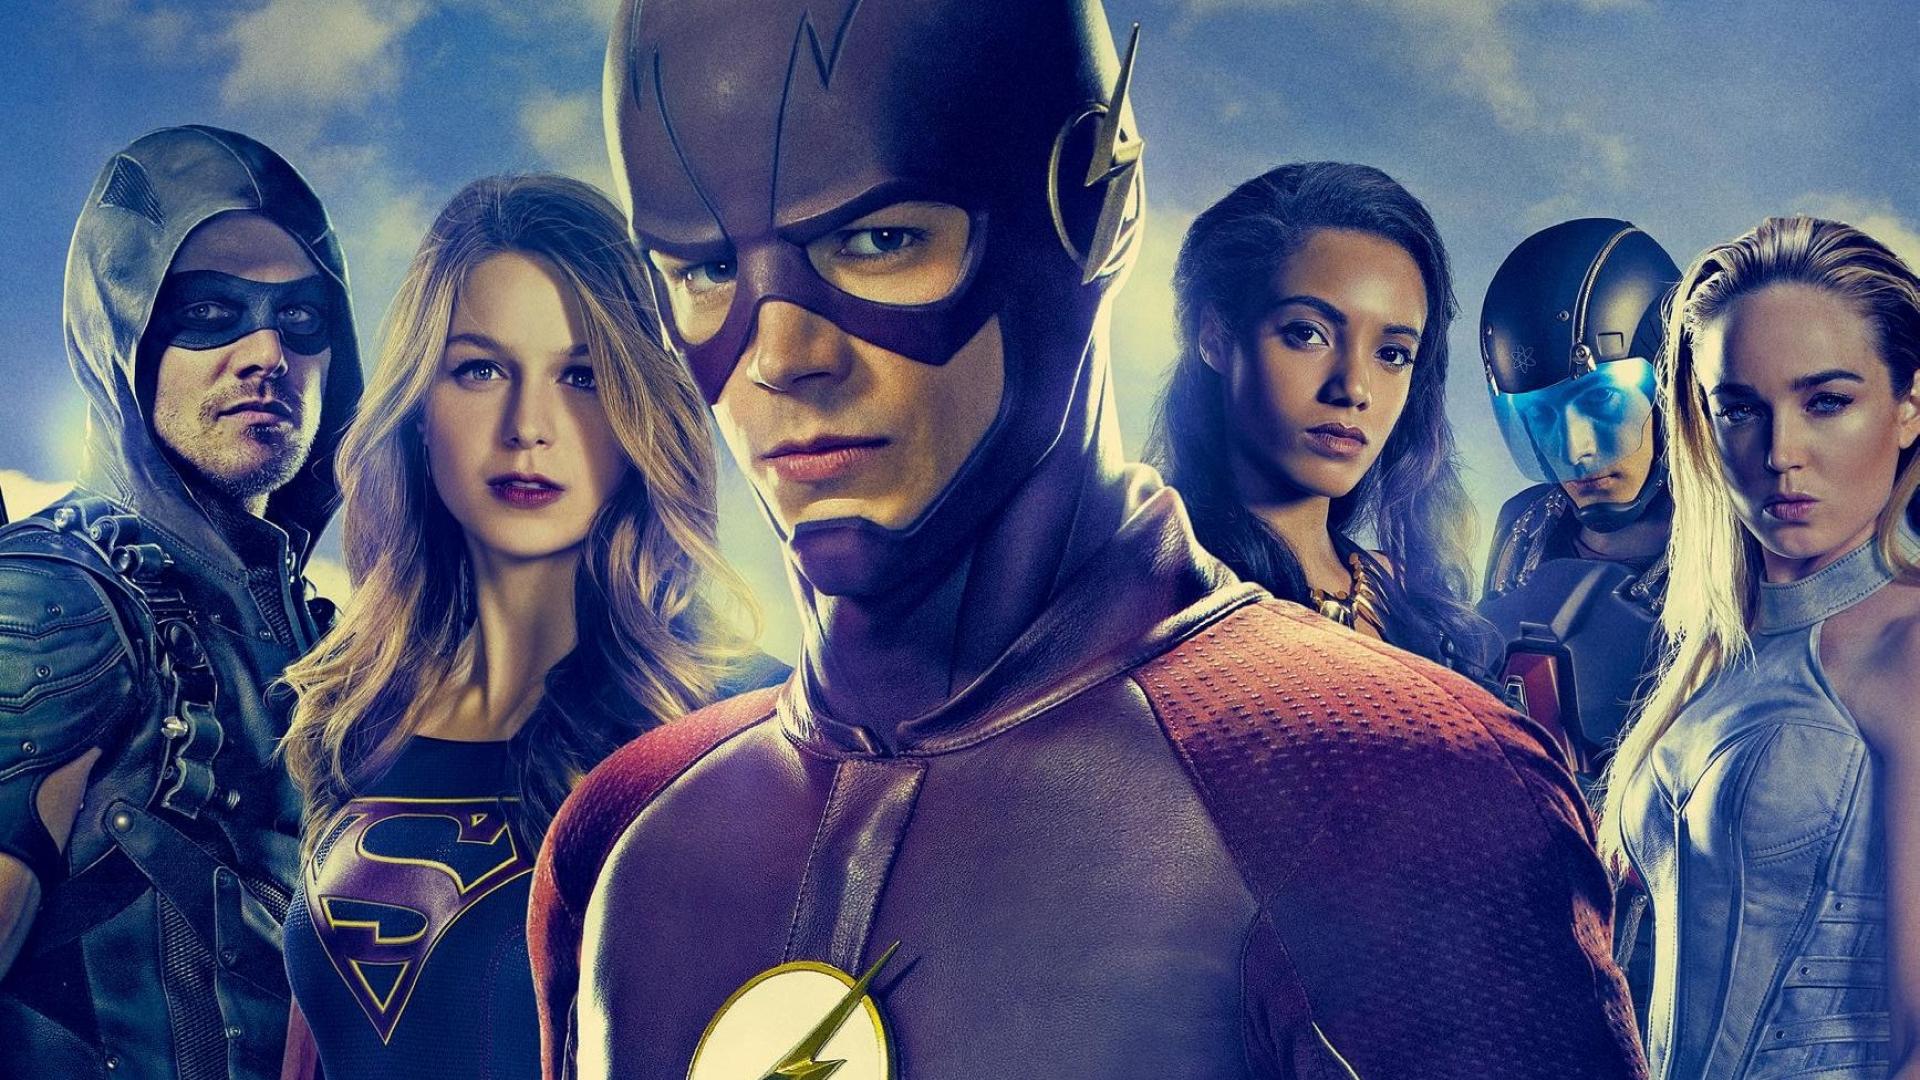 1920x1080 Dc Tv Superheros Flash Supergirl Arrow 1080p Laptop Full